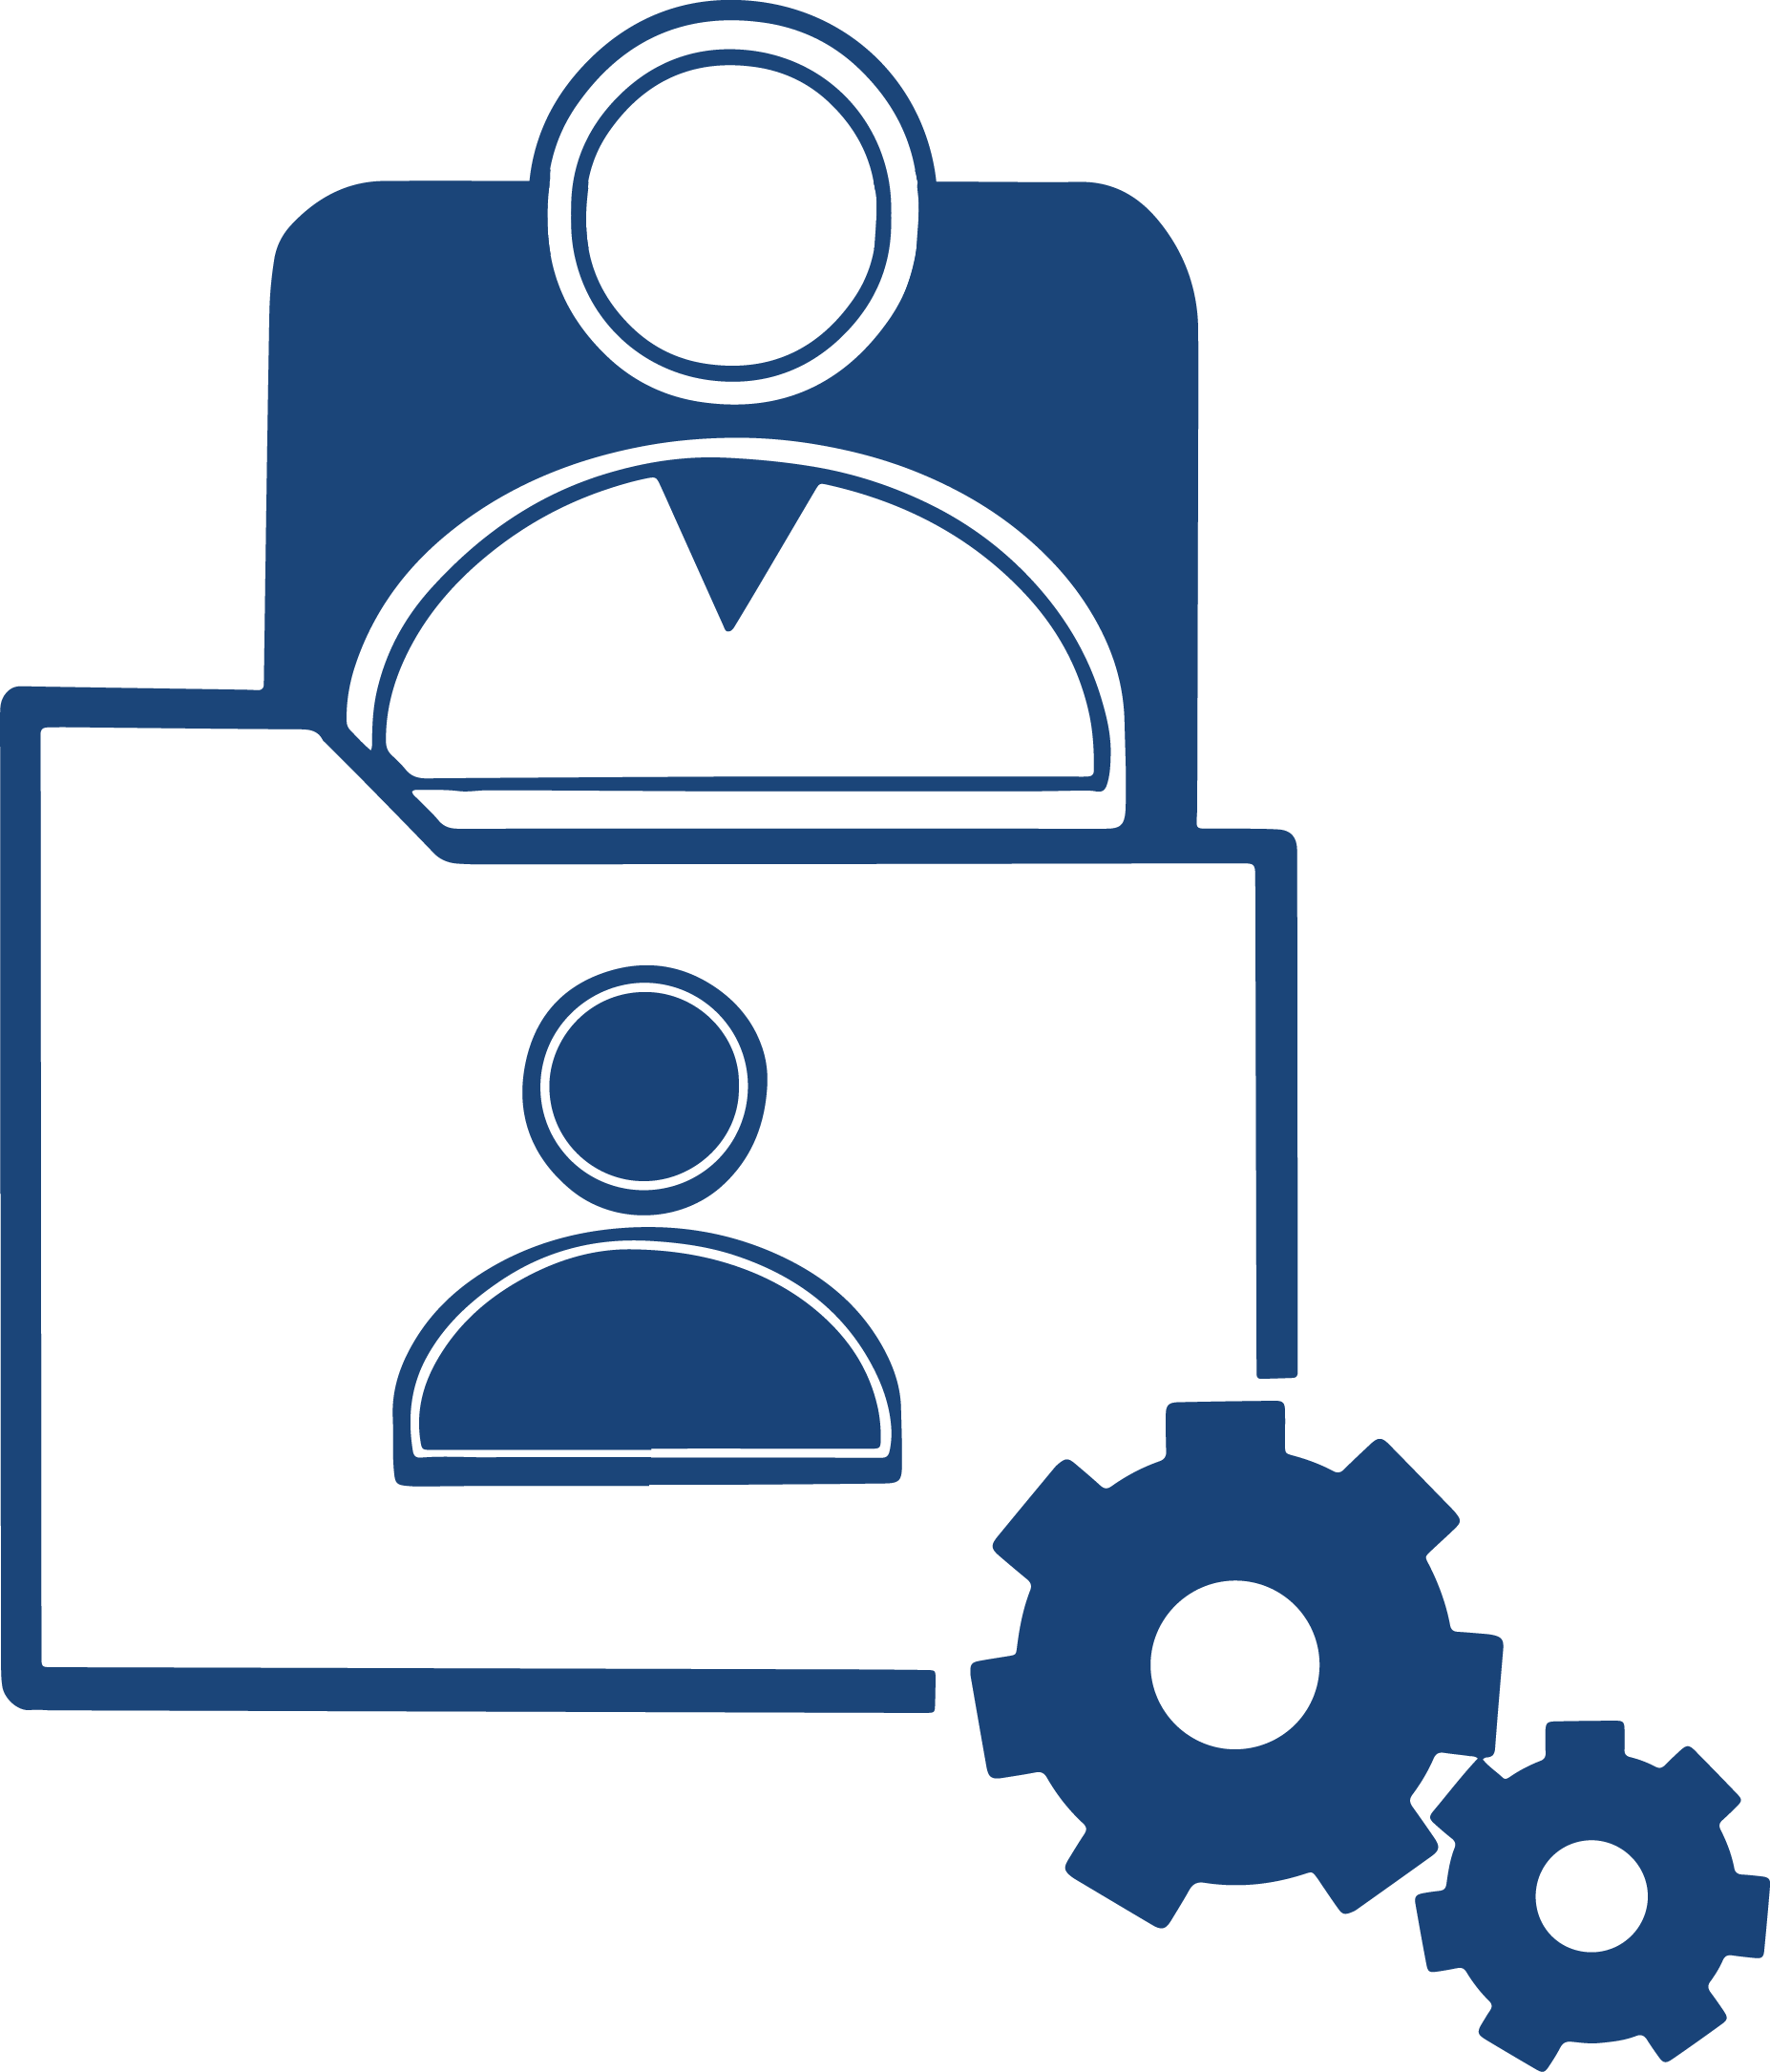 Supervisory authority icon